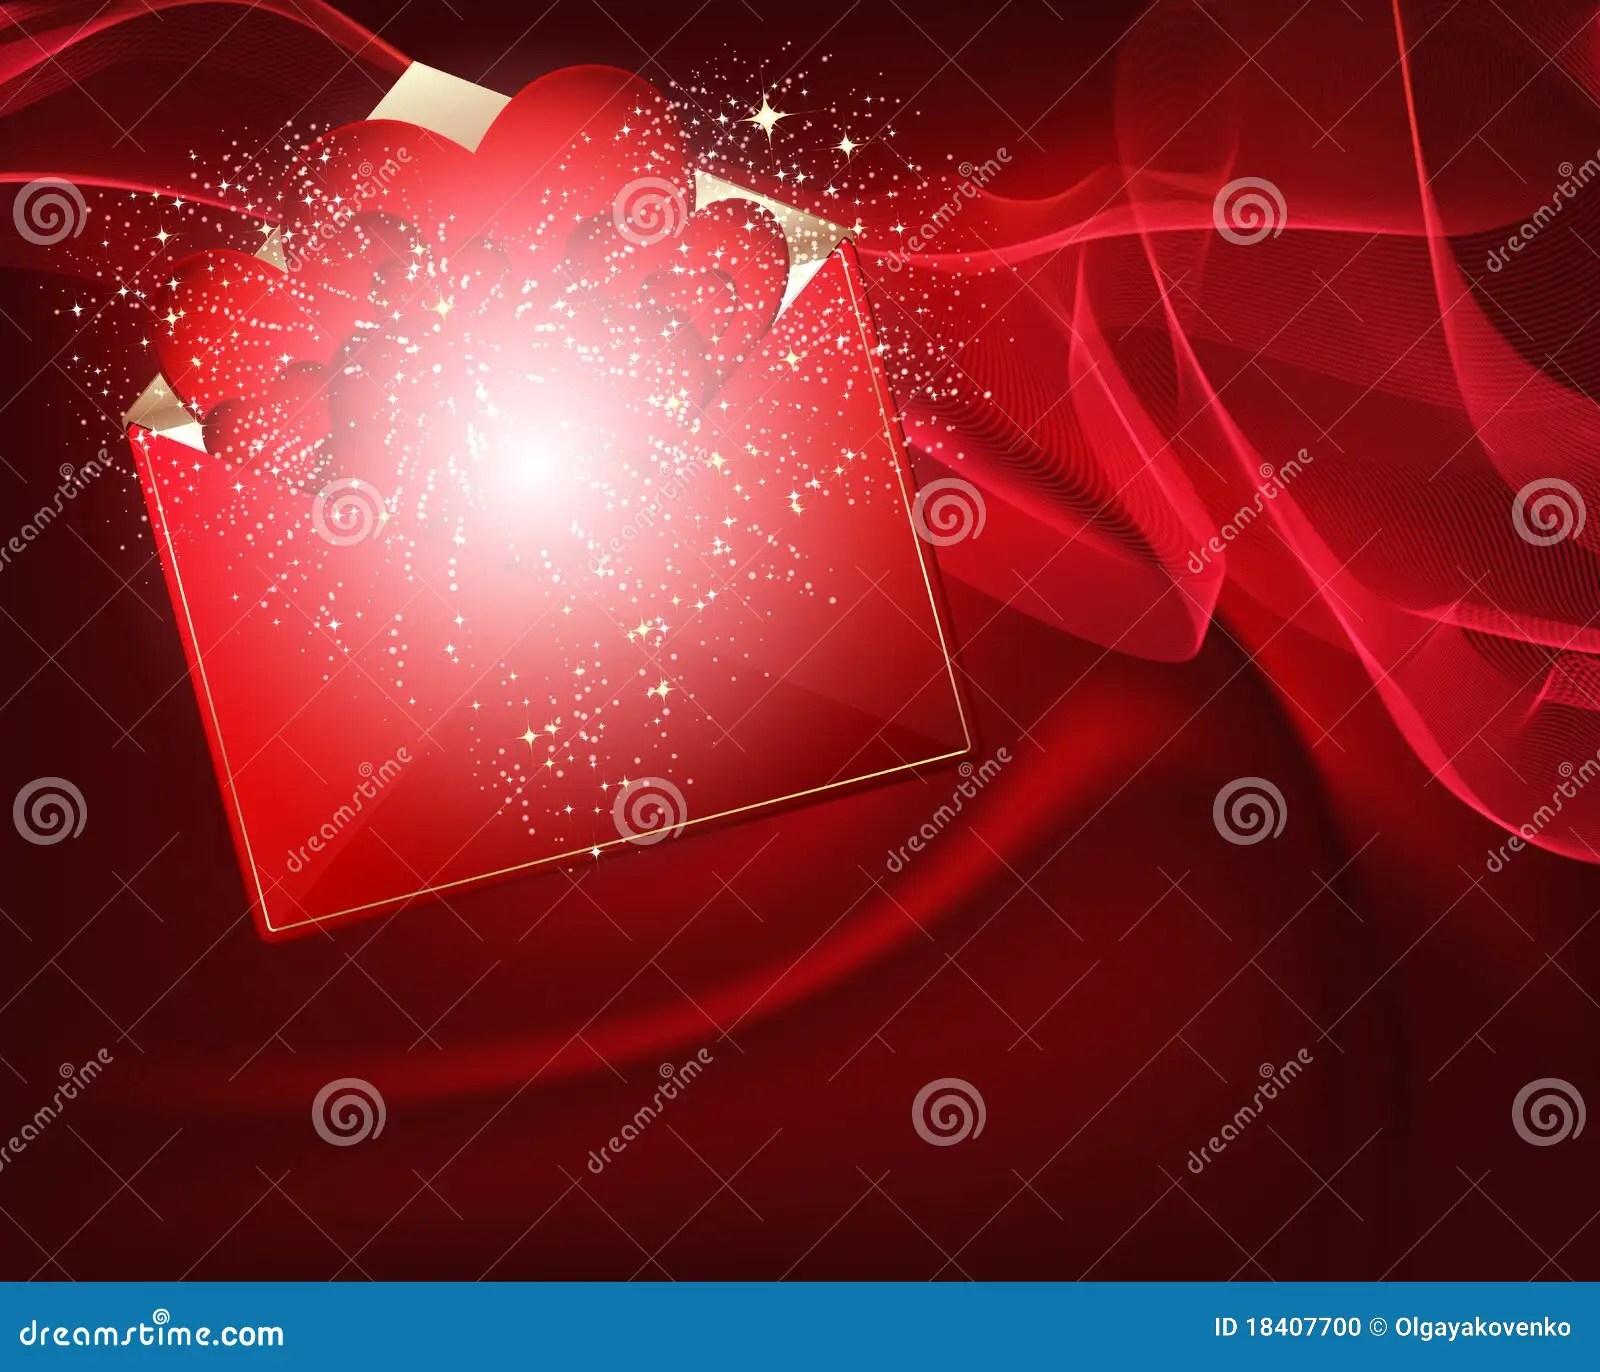 Wallpaper San Valentin 3d Beautiful Heart Background Design Stock Photo Image